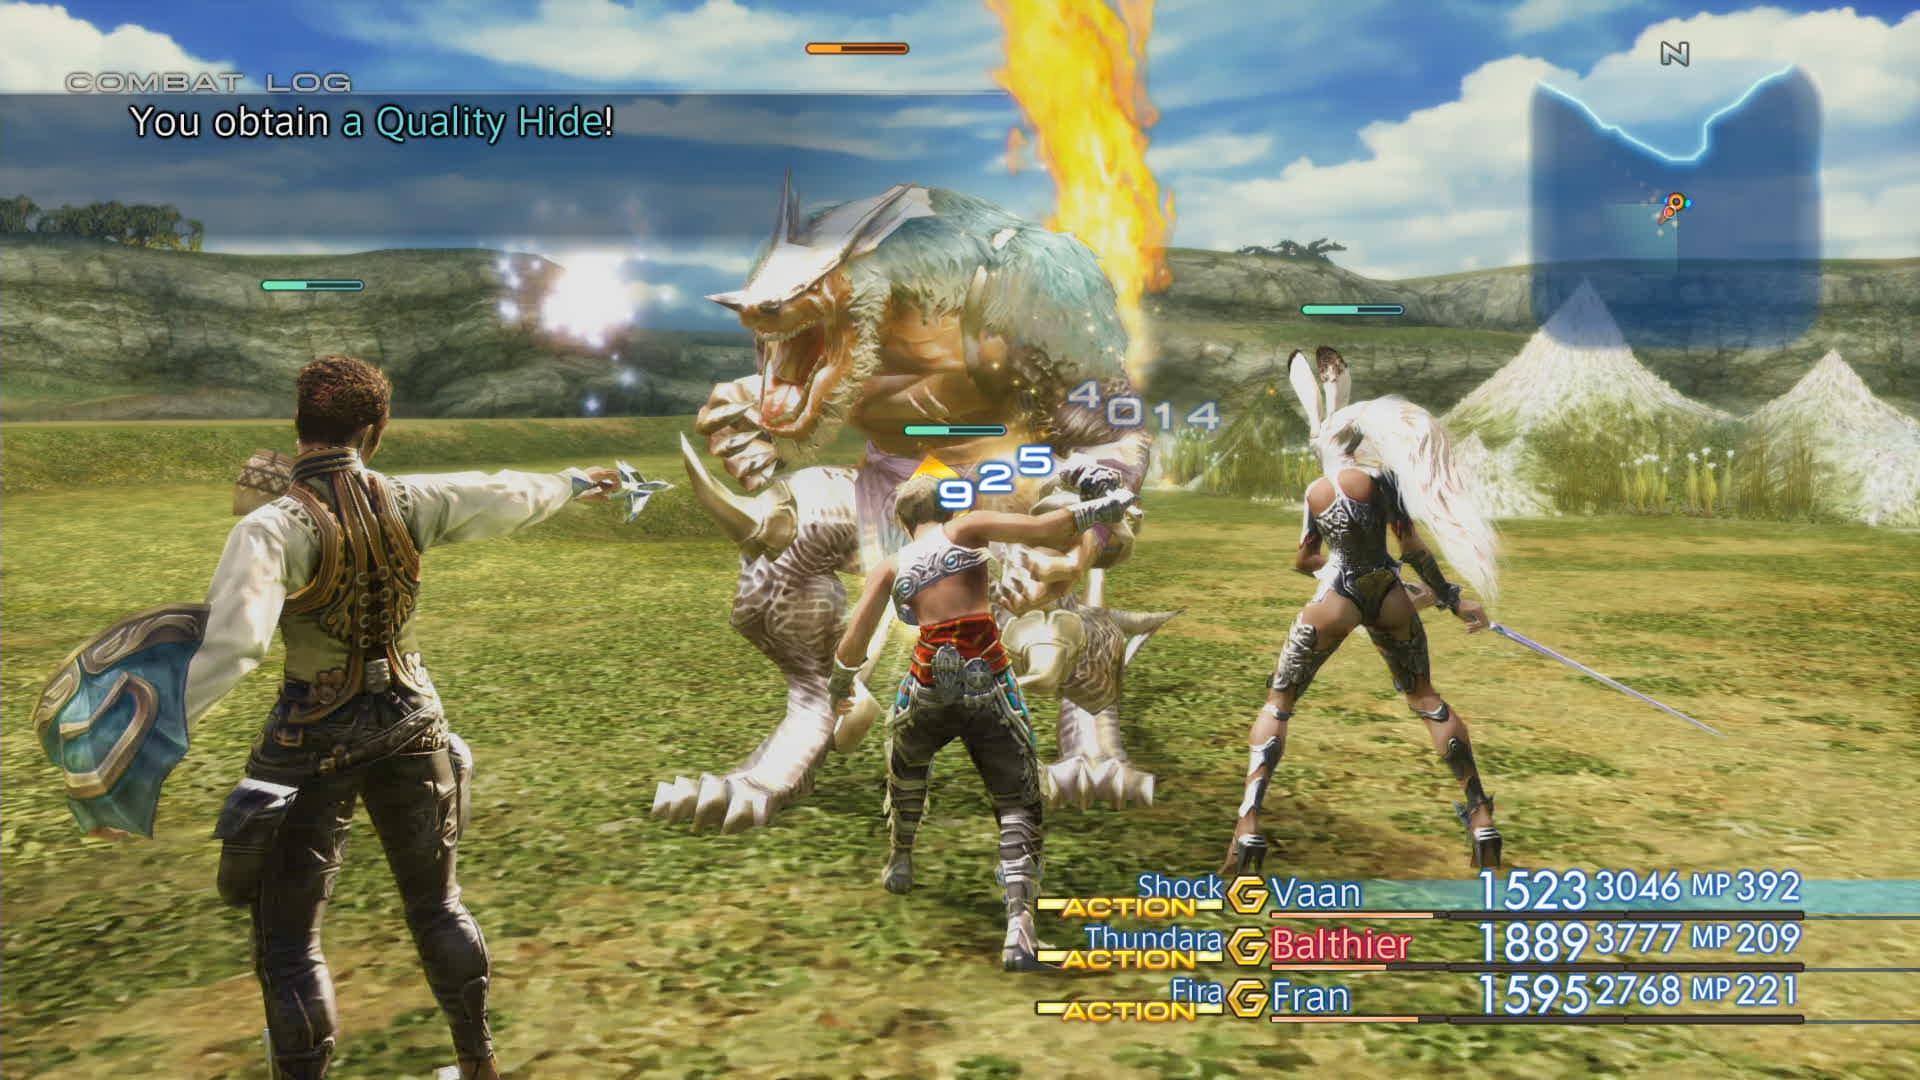 Final Fantasy XII: The Zodiac Age - Best Job Combinations